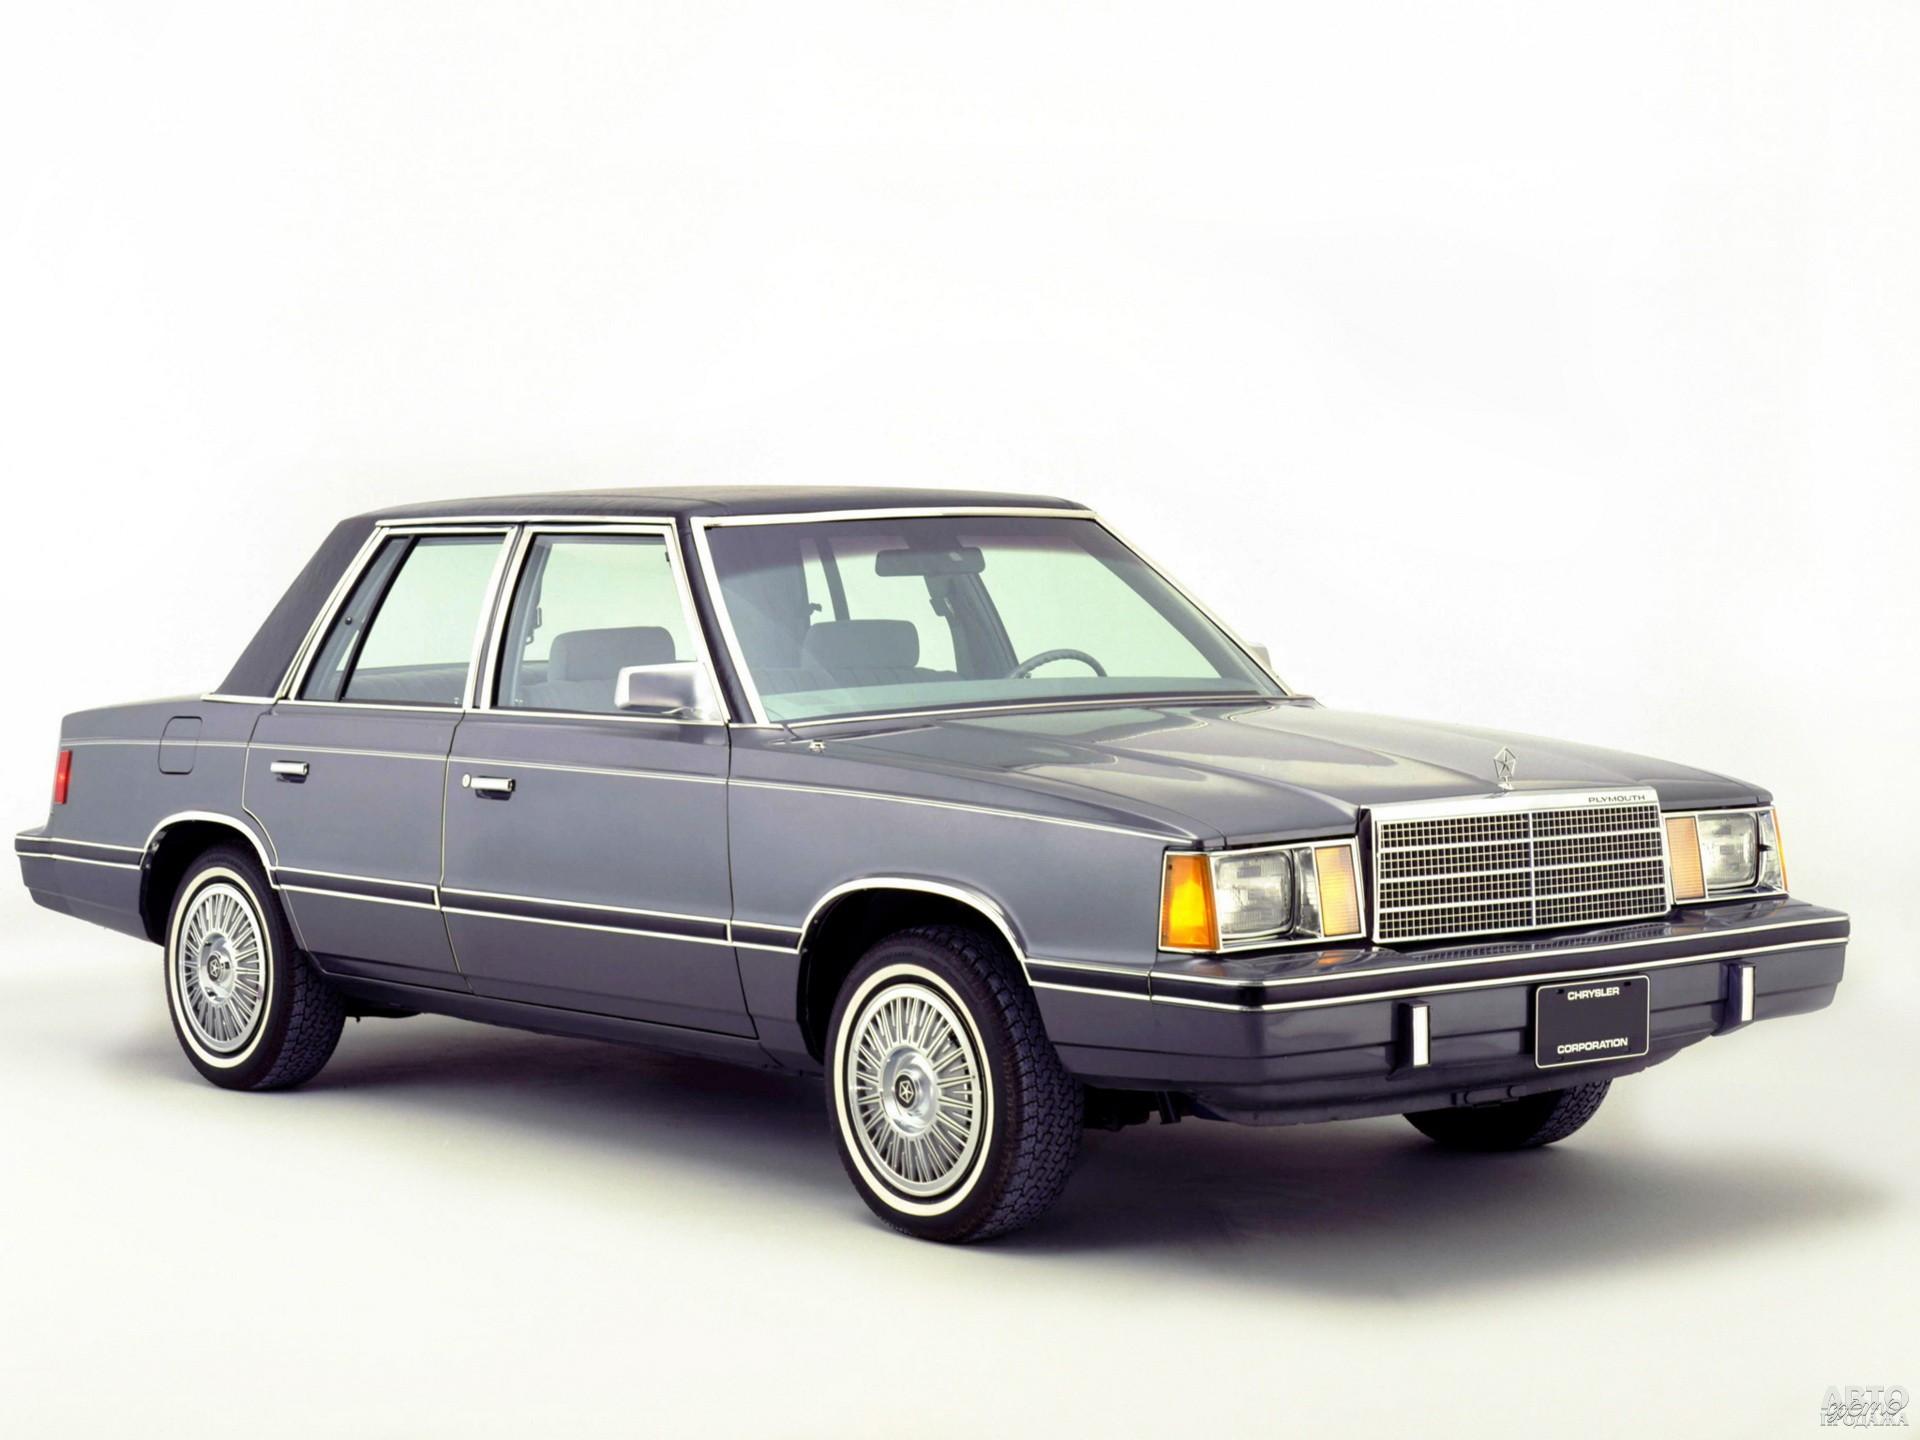 Plymouth Reliant 1981 года – представитель К-серии